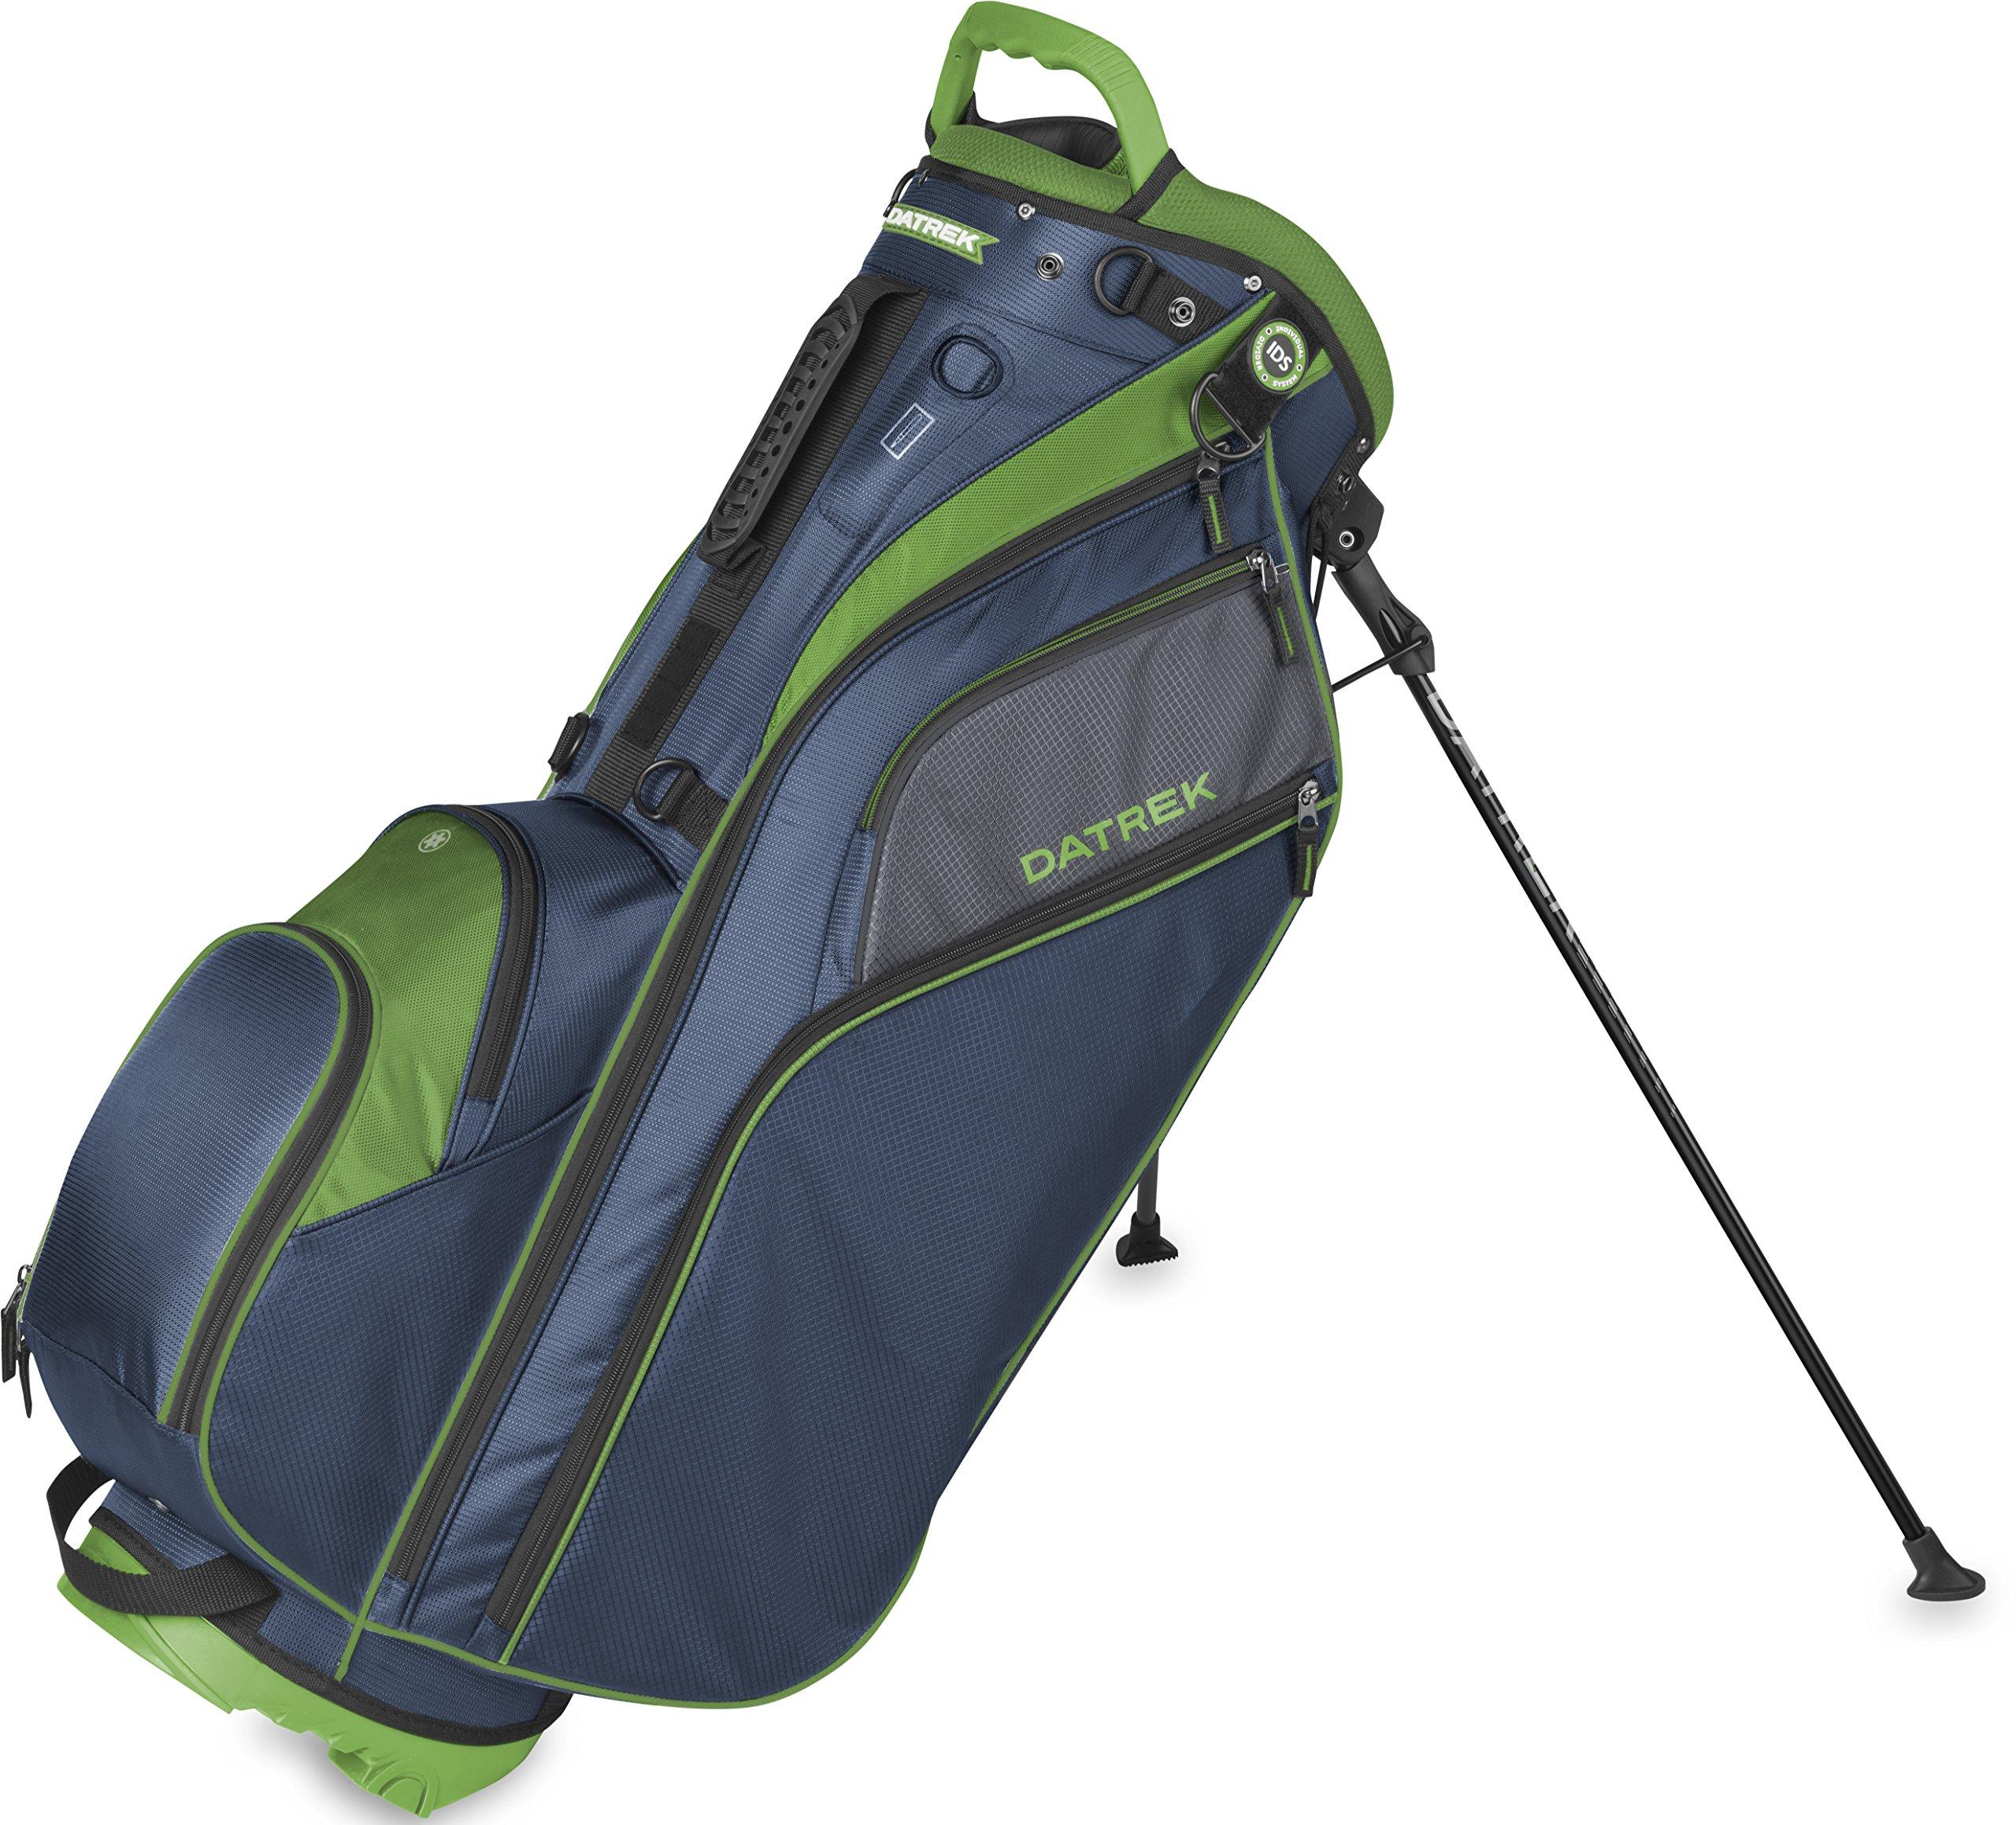 Datrek Golf Go Lite Hybrid Stand Bag (Navy/Slate/Lime)